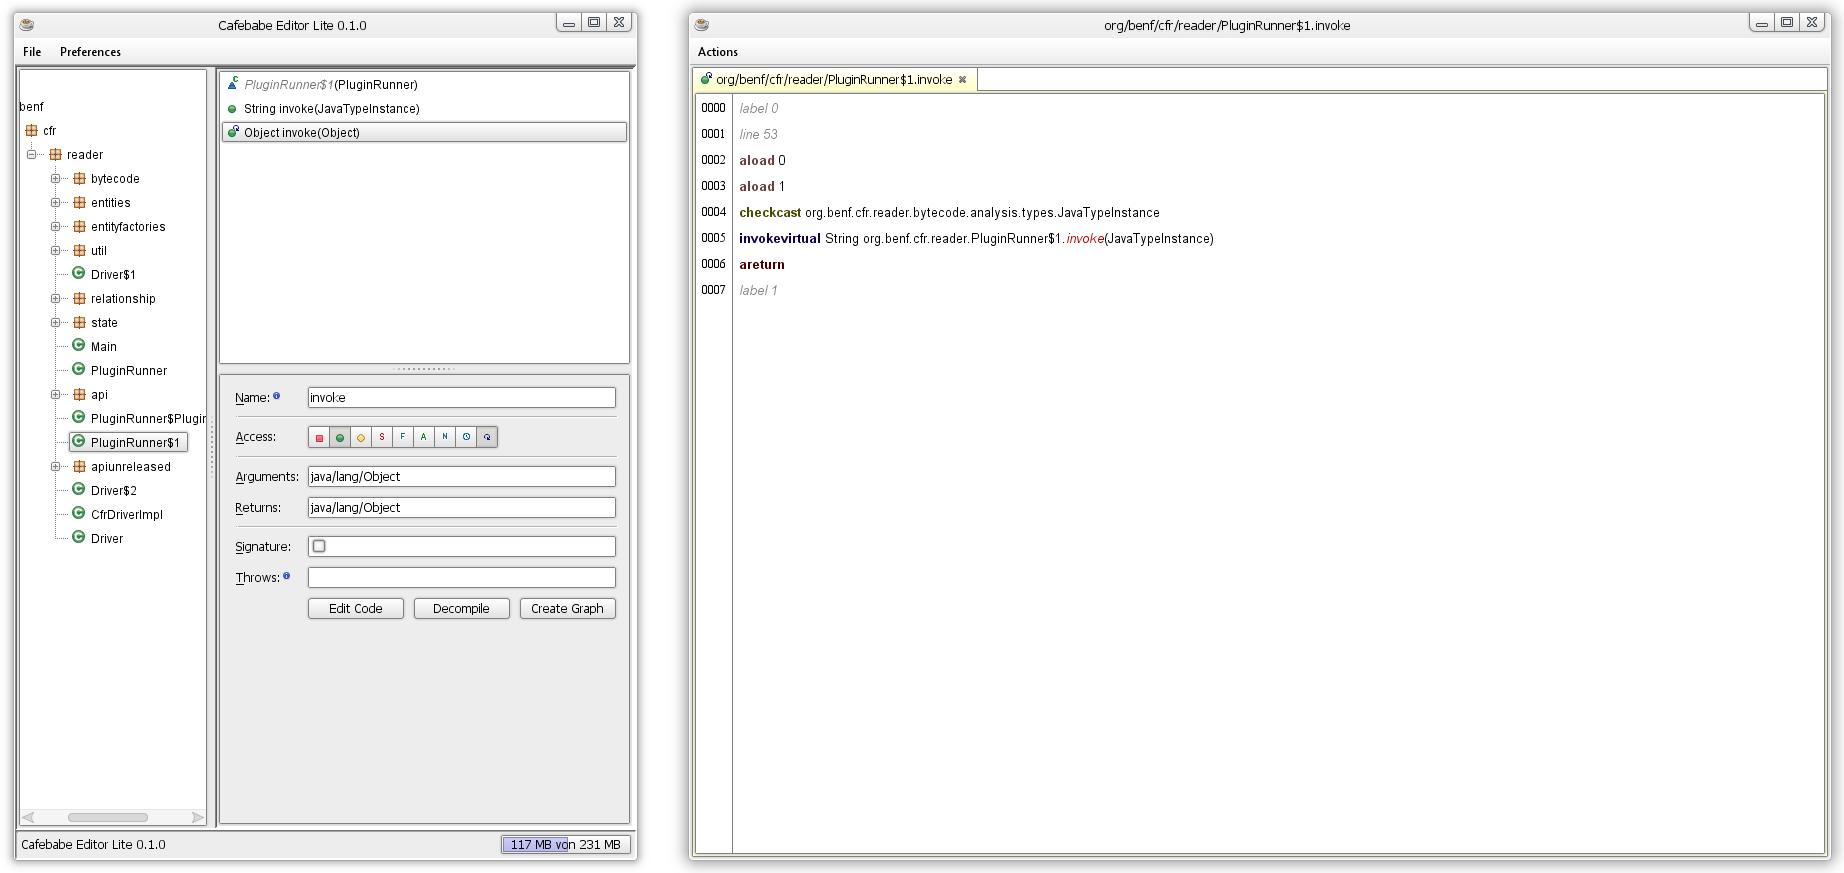 GitHub - GraxCode/Cafebabe: Easy-to-use java bytecode editor